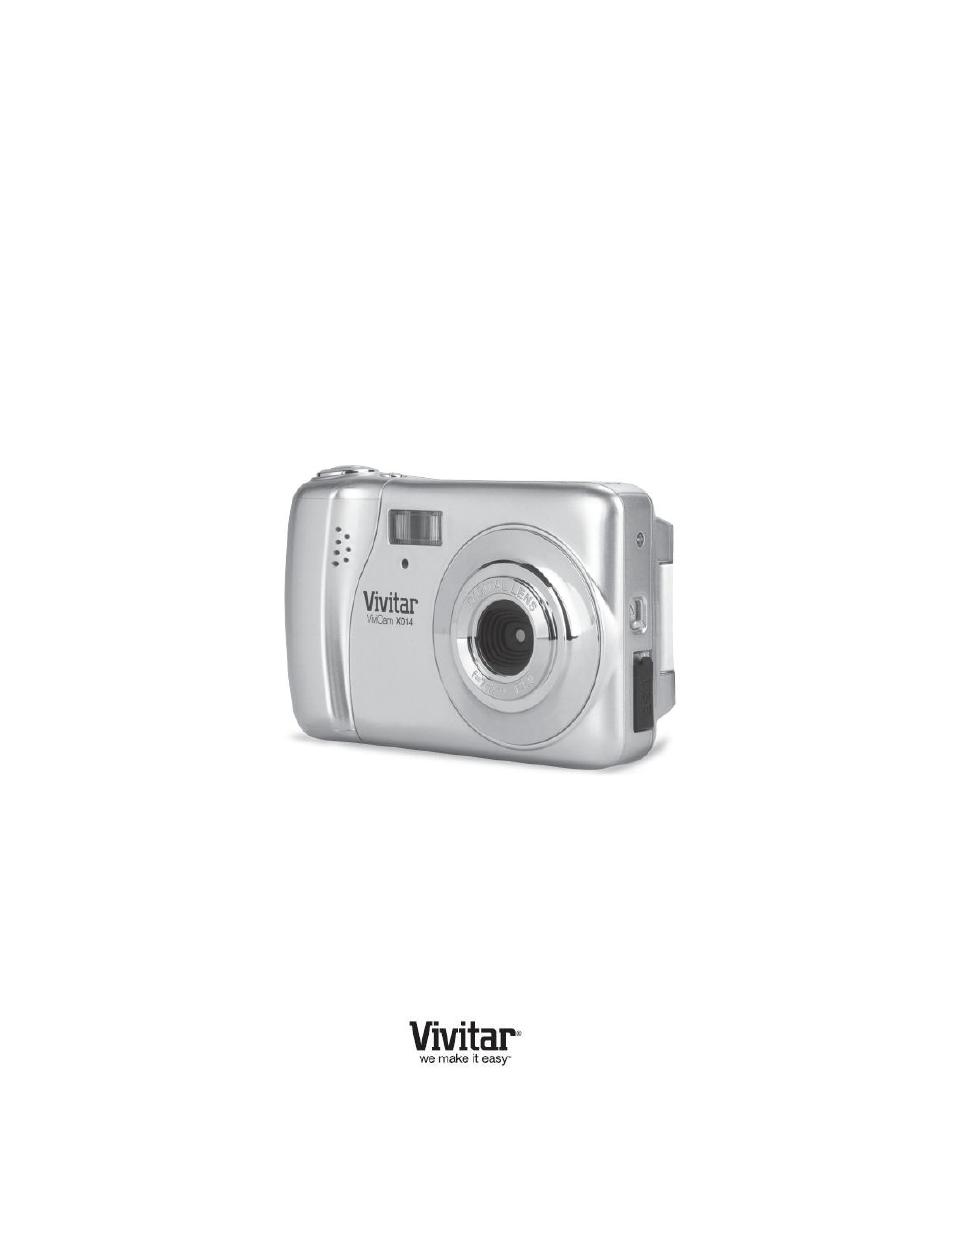 vivitar vivicam x014 user manual 56 pages rh manualsdir com Vivitar Camera Manual Vivitar Drone Manual